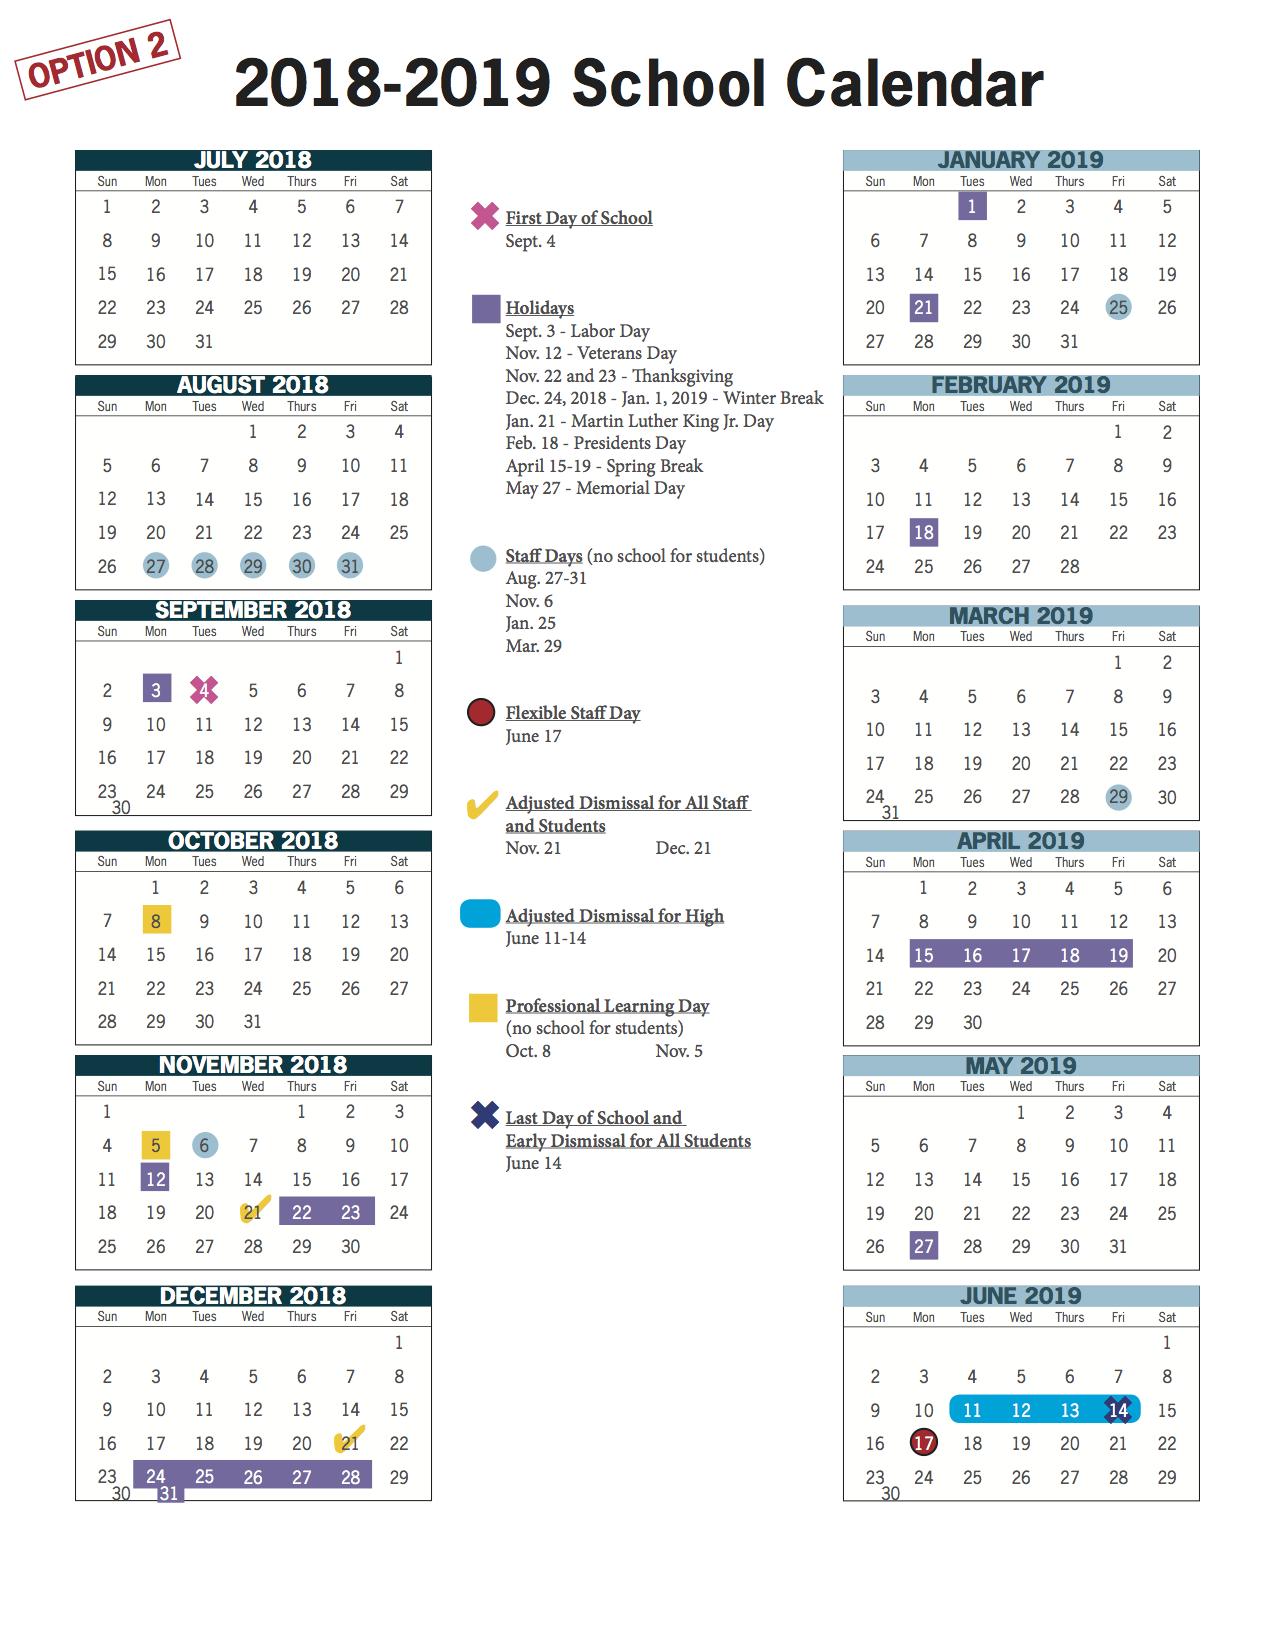 Virginia Beach Public Schools Calendar 2019 VBCPS E Town Hall   2018 2019 and 2019 2020 School Calendar Review